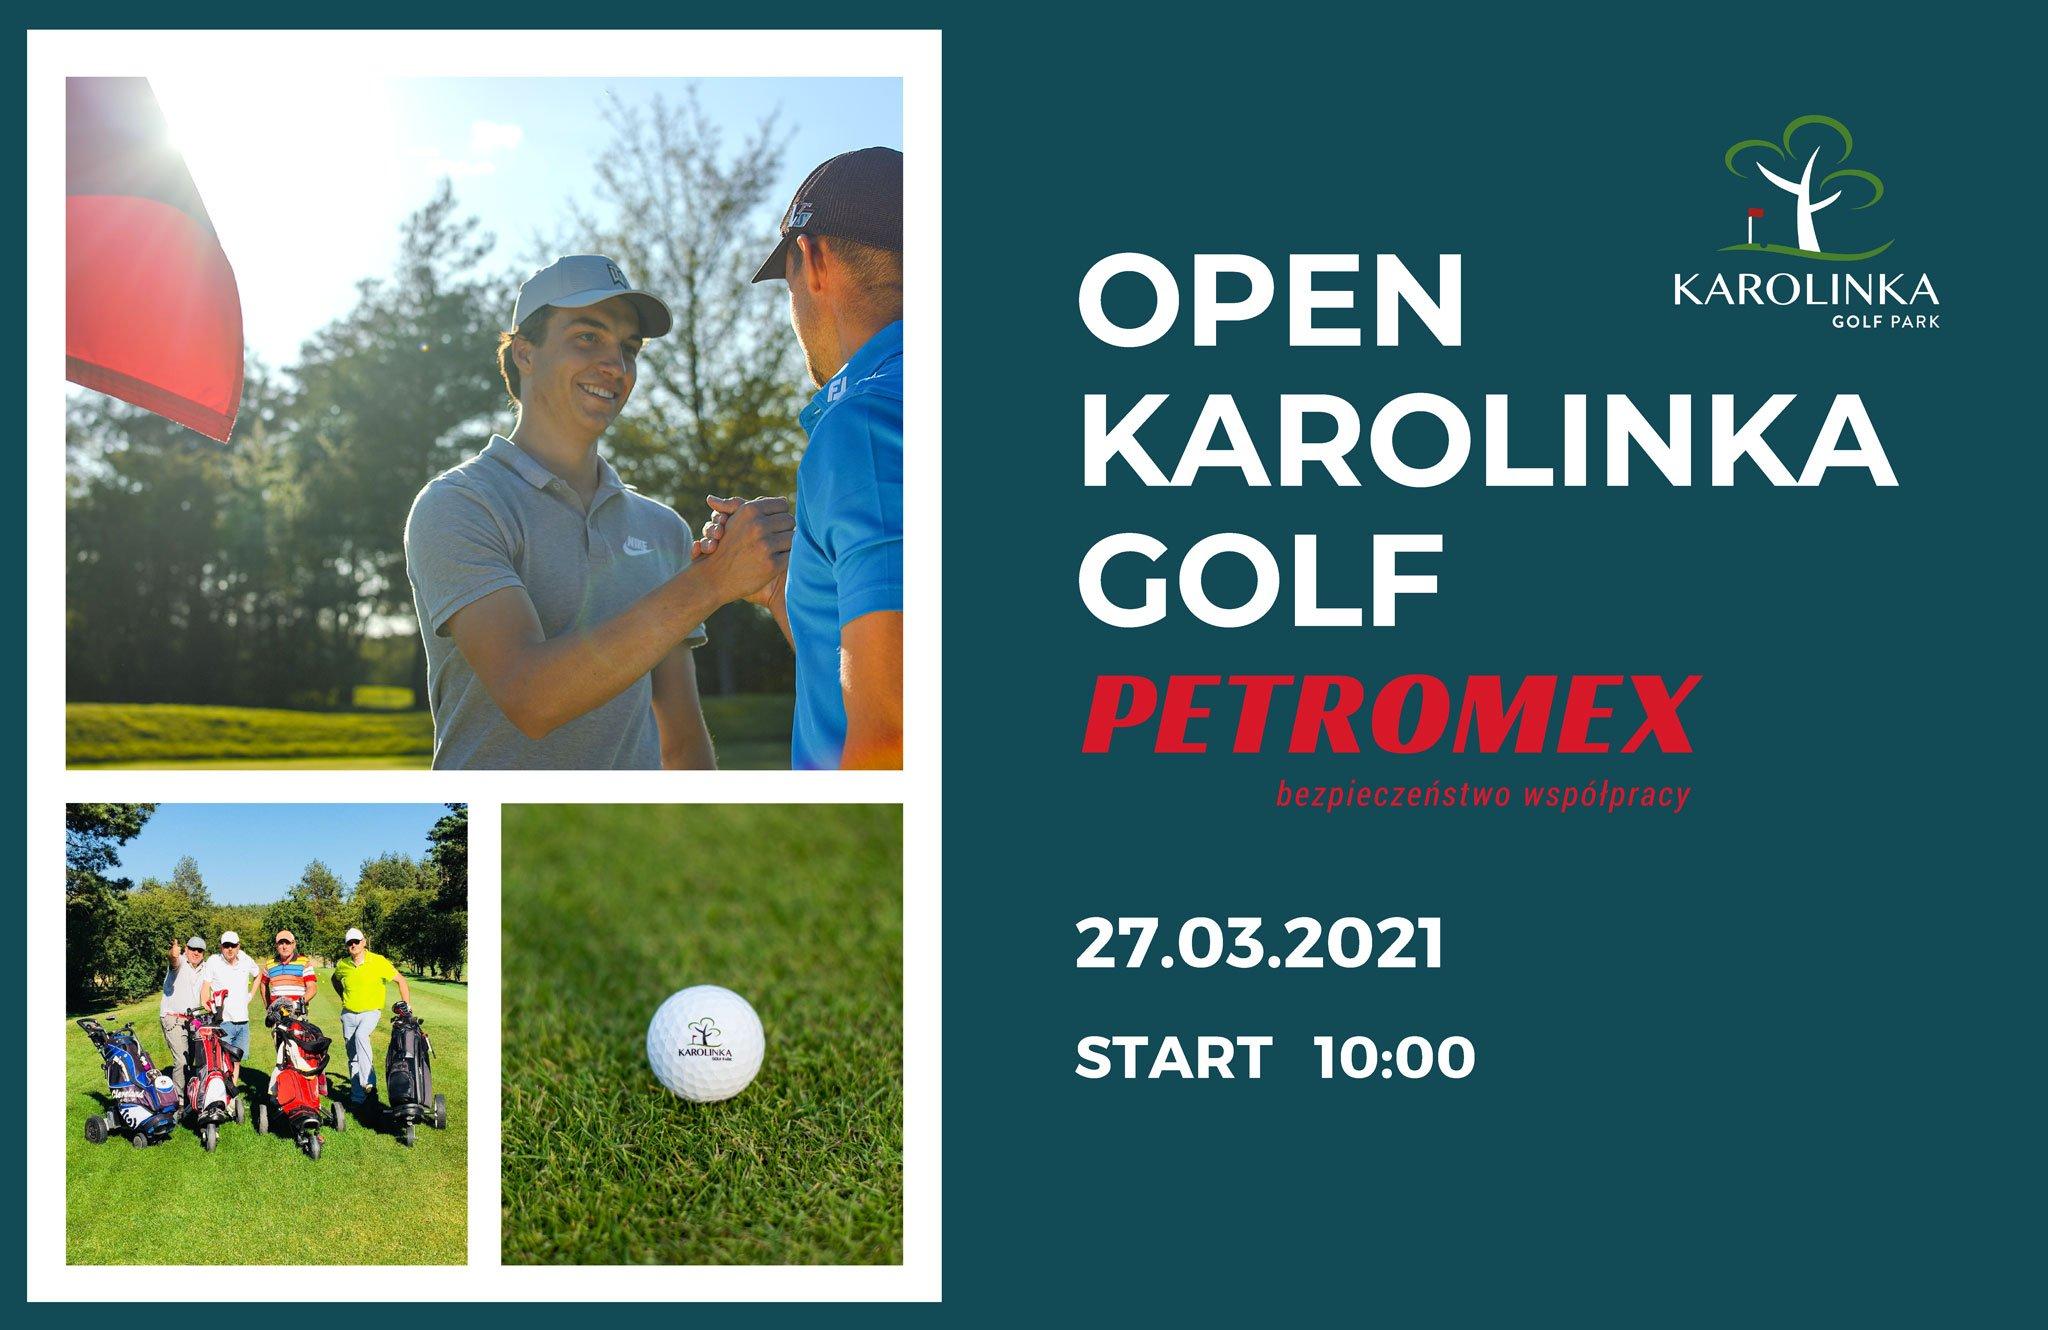 Open Karolinka Golf Petromex turniej